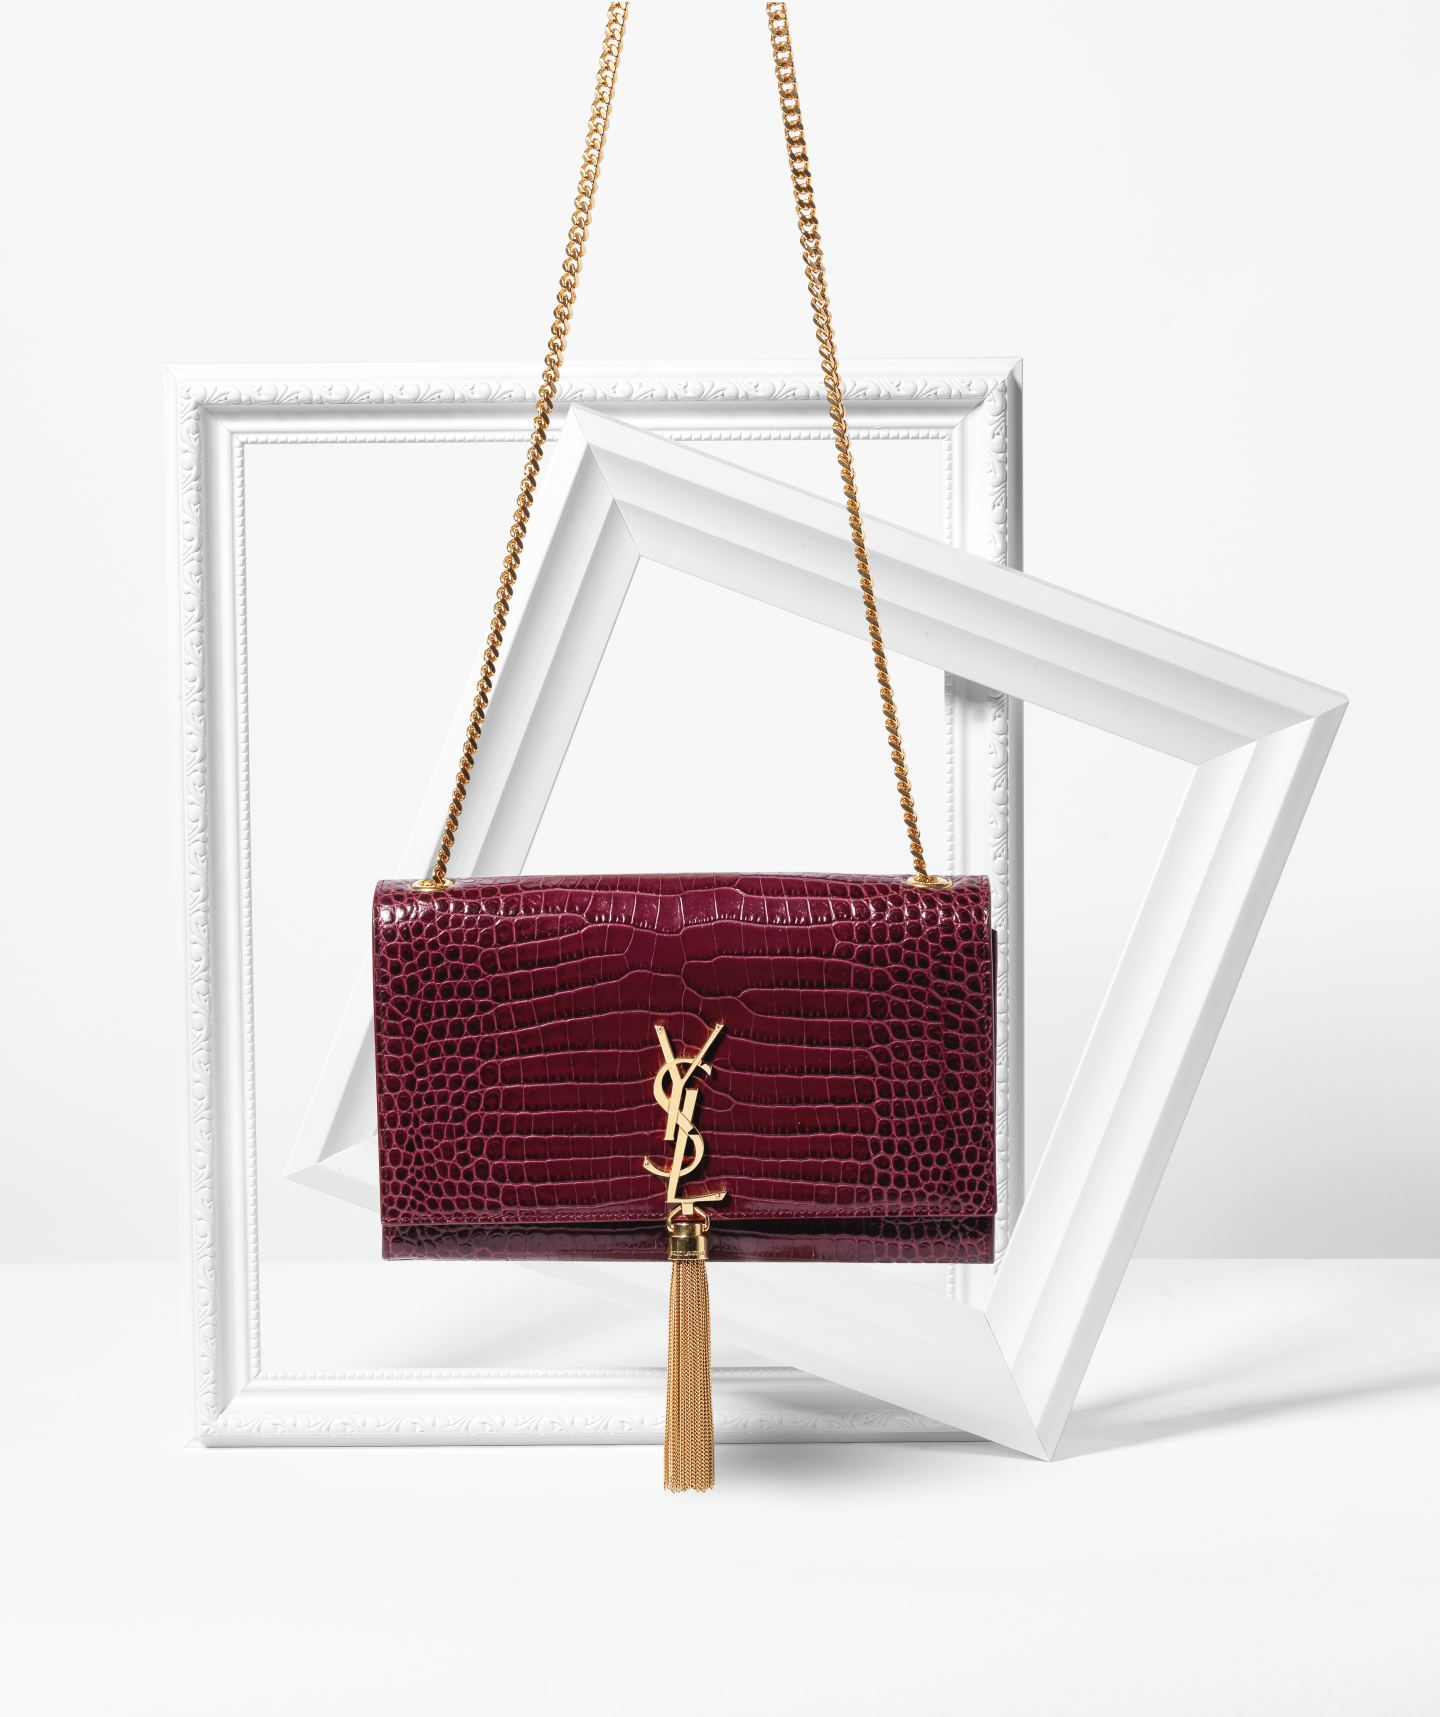 ysl chain clutch bag tassel